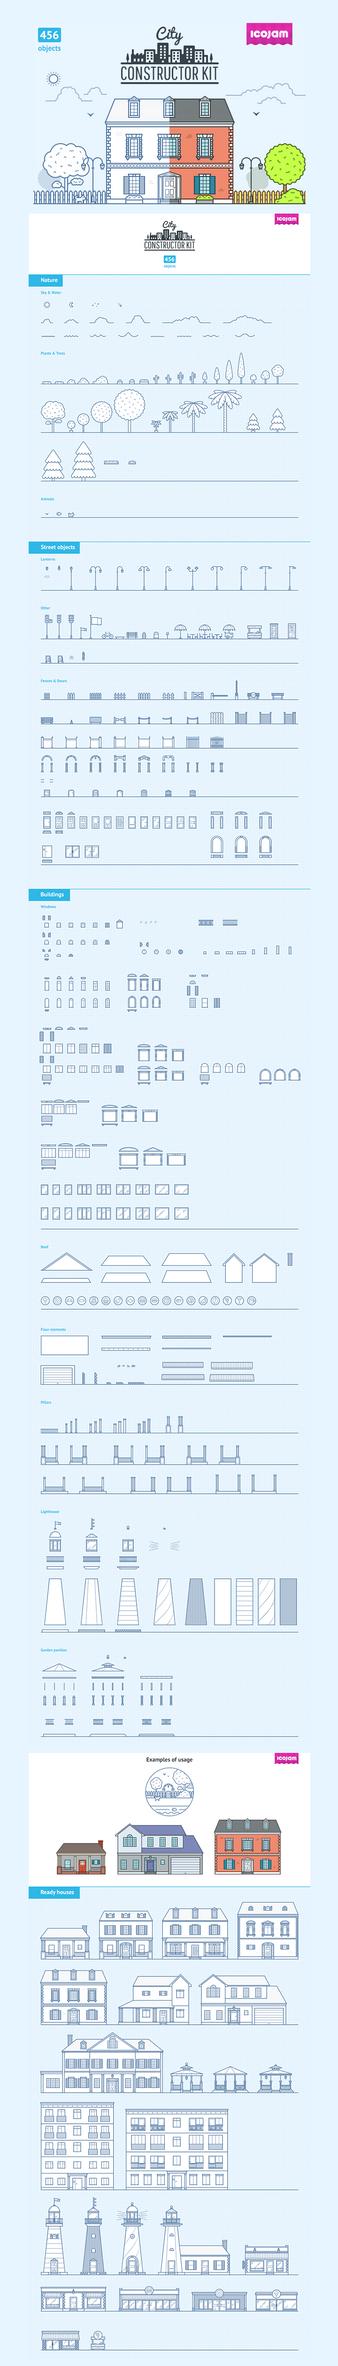 City Constructor Kit by sandracz